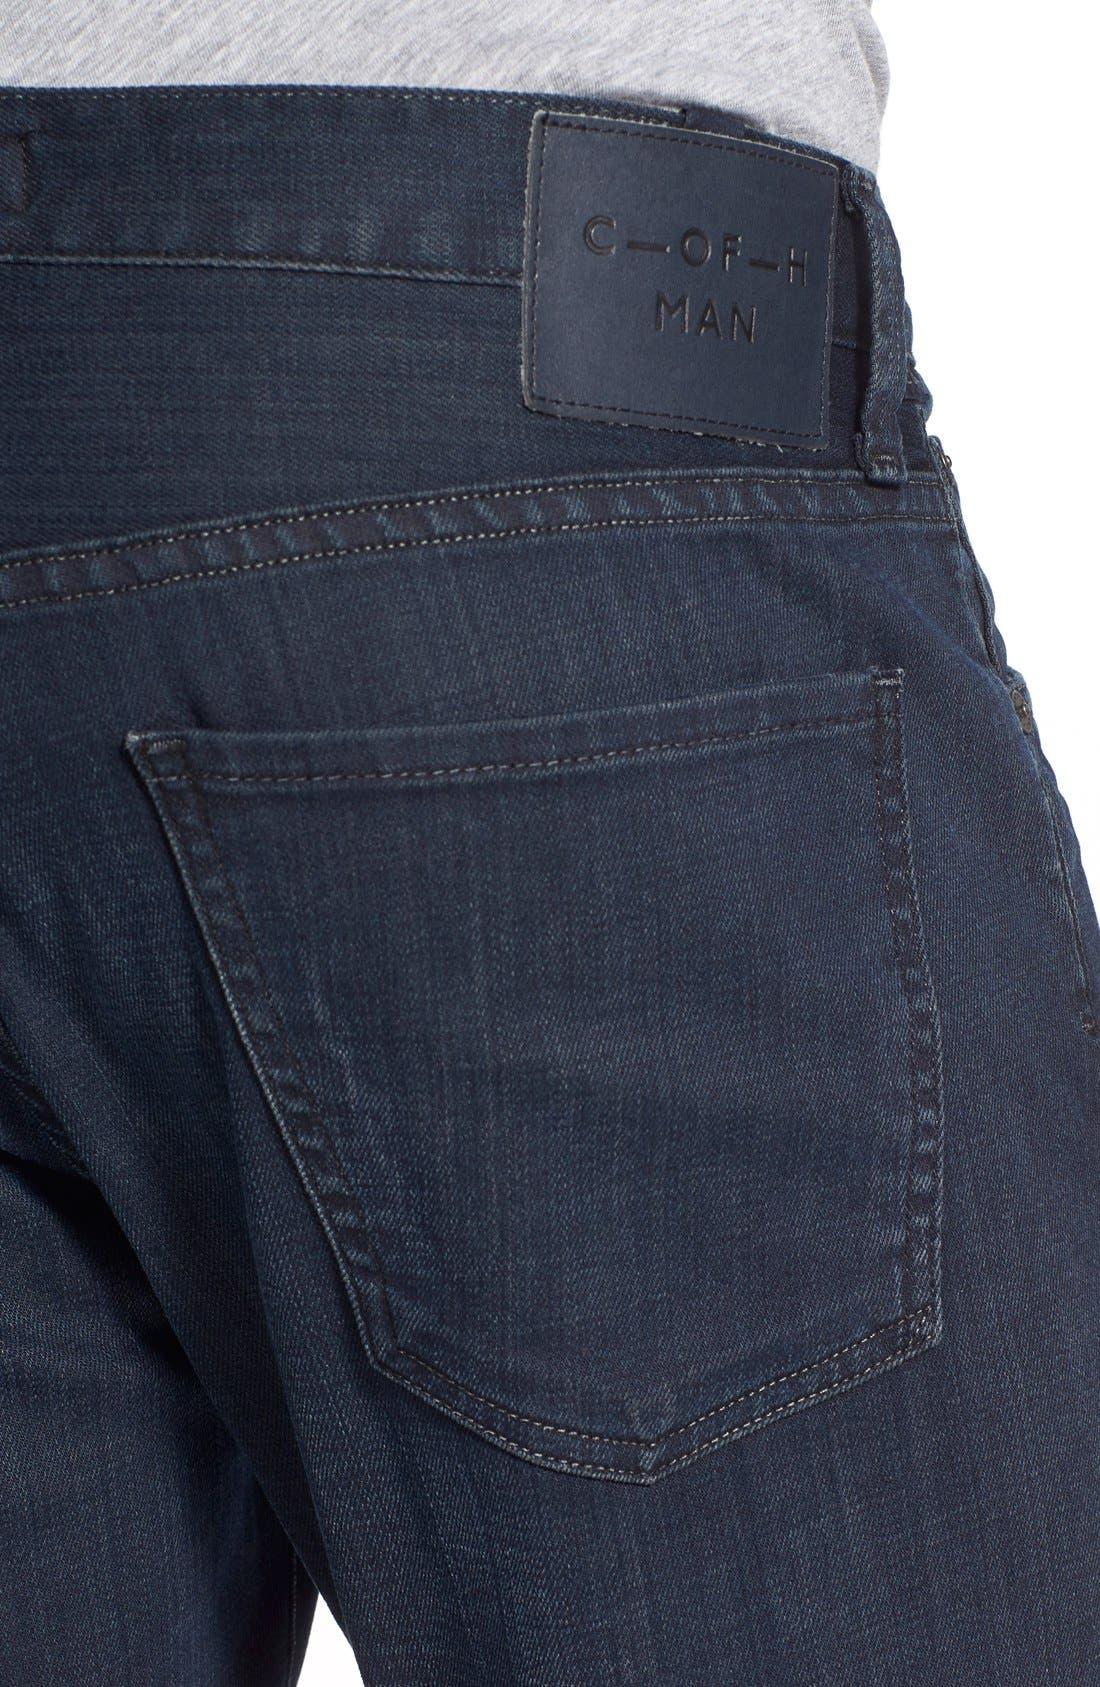 Gage Slim Straight Leg Jeans,                             Alternate thumbnail 4, color,                             Duvall